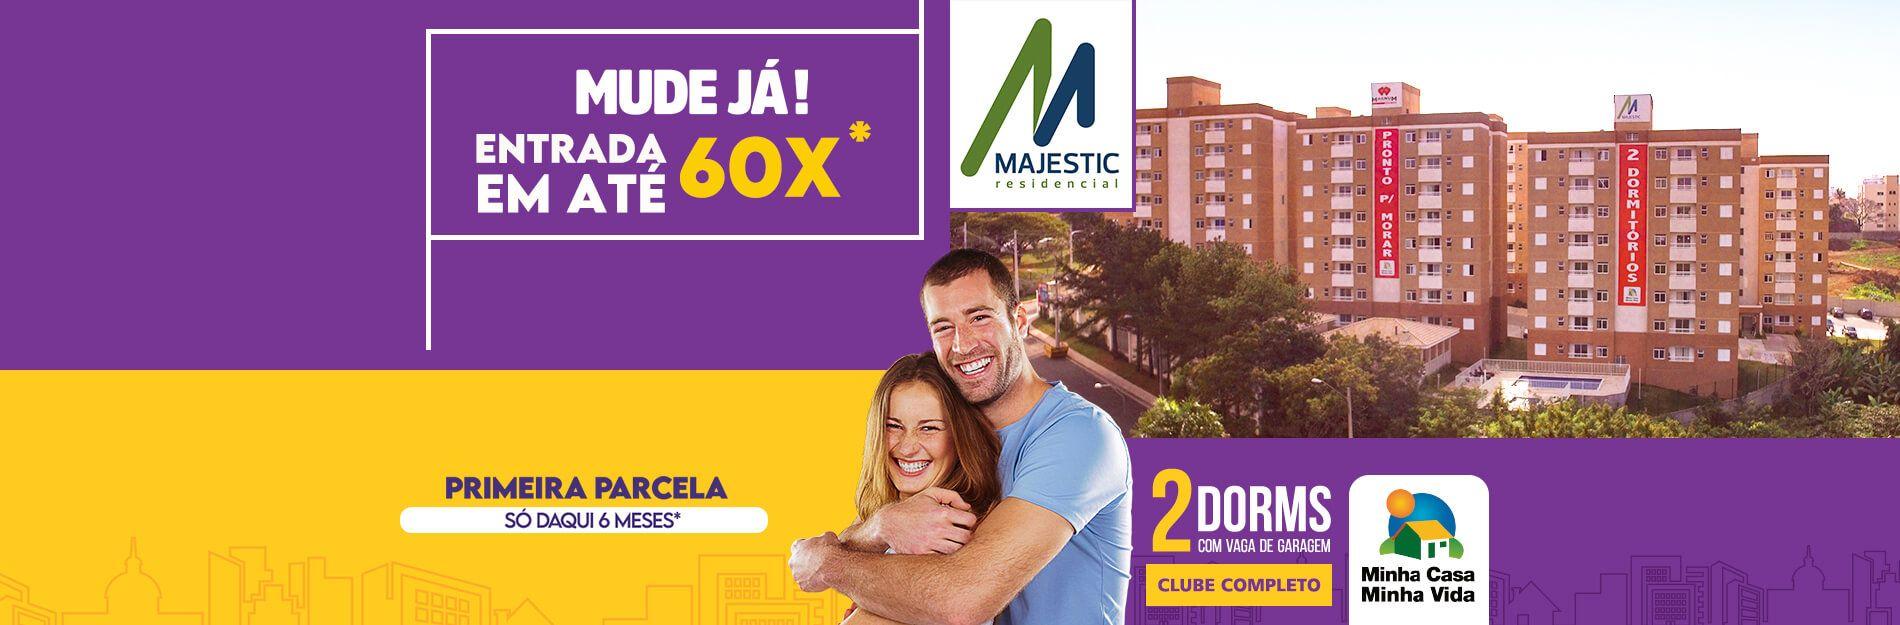 Majestic Apartamentos Sorocaba - SP - Magnum Construtora